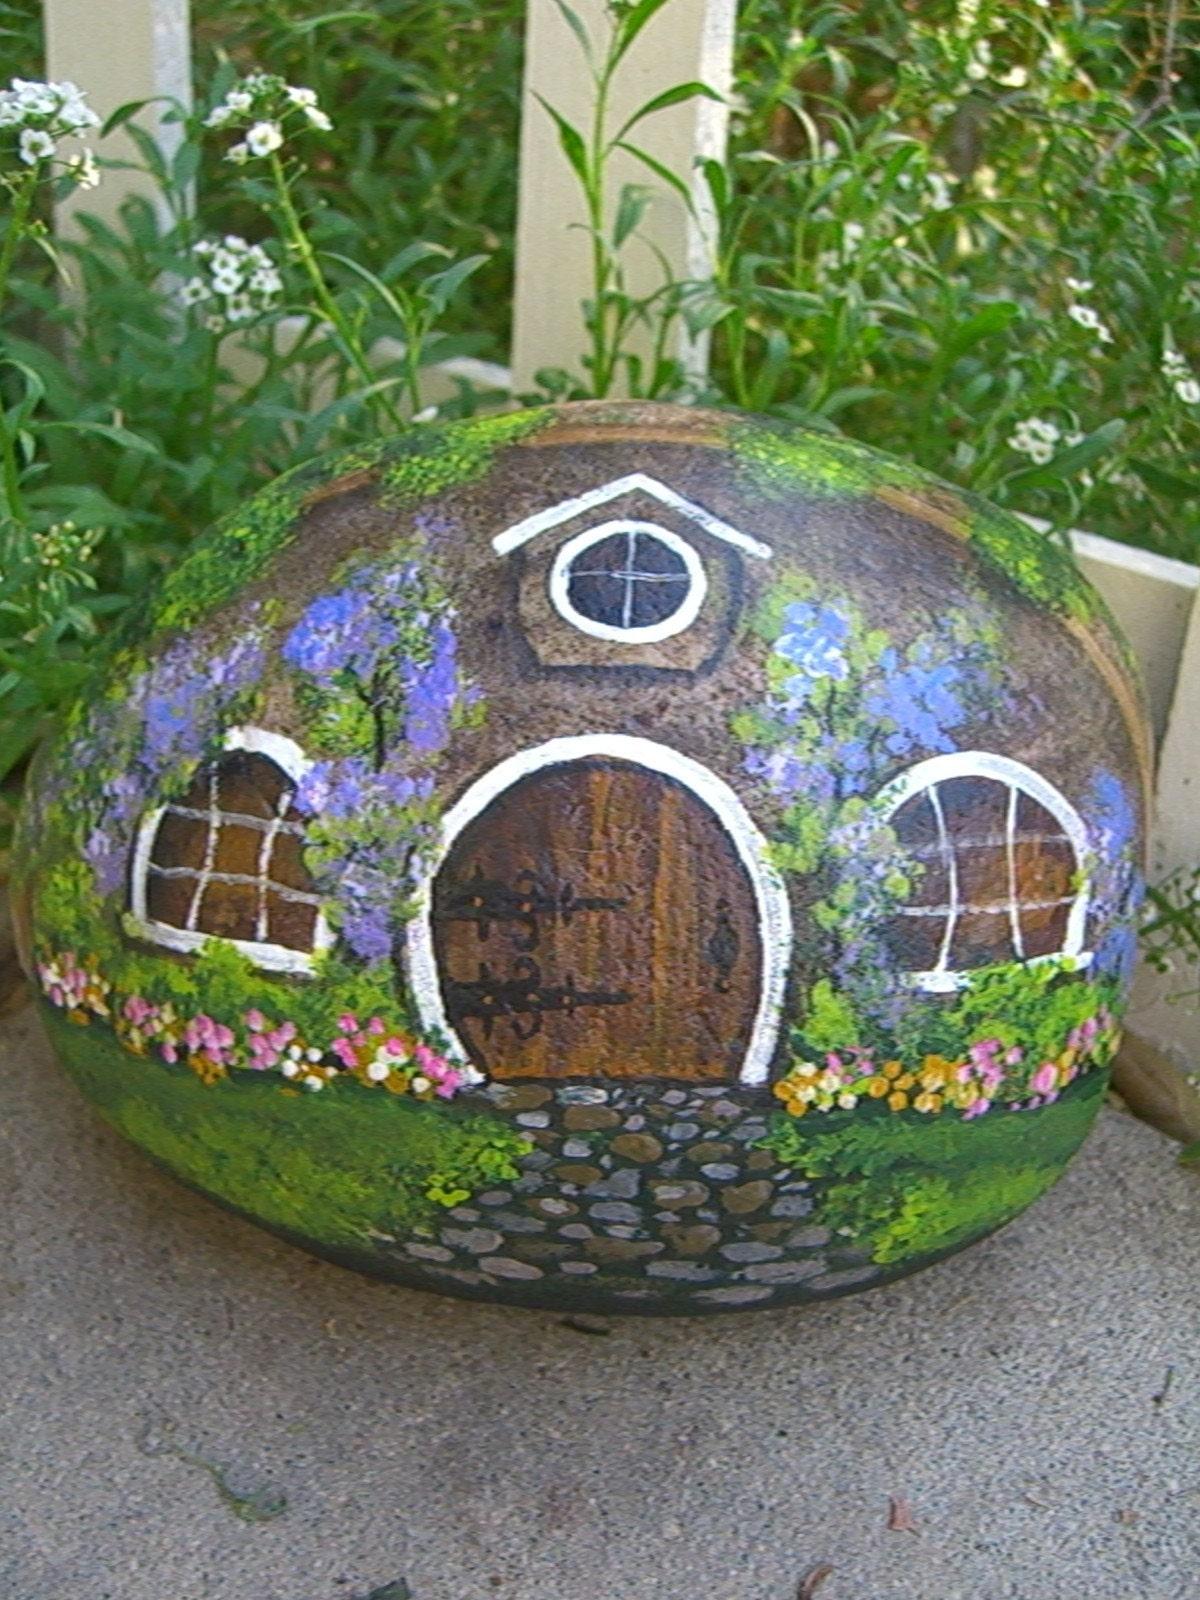 Hobbit House Painted Rock Art By Mygardenrocks On Etsy